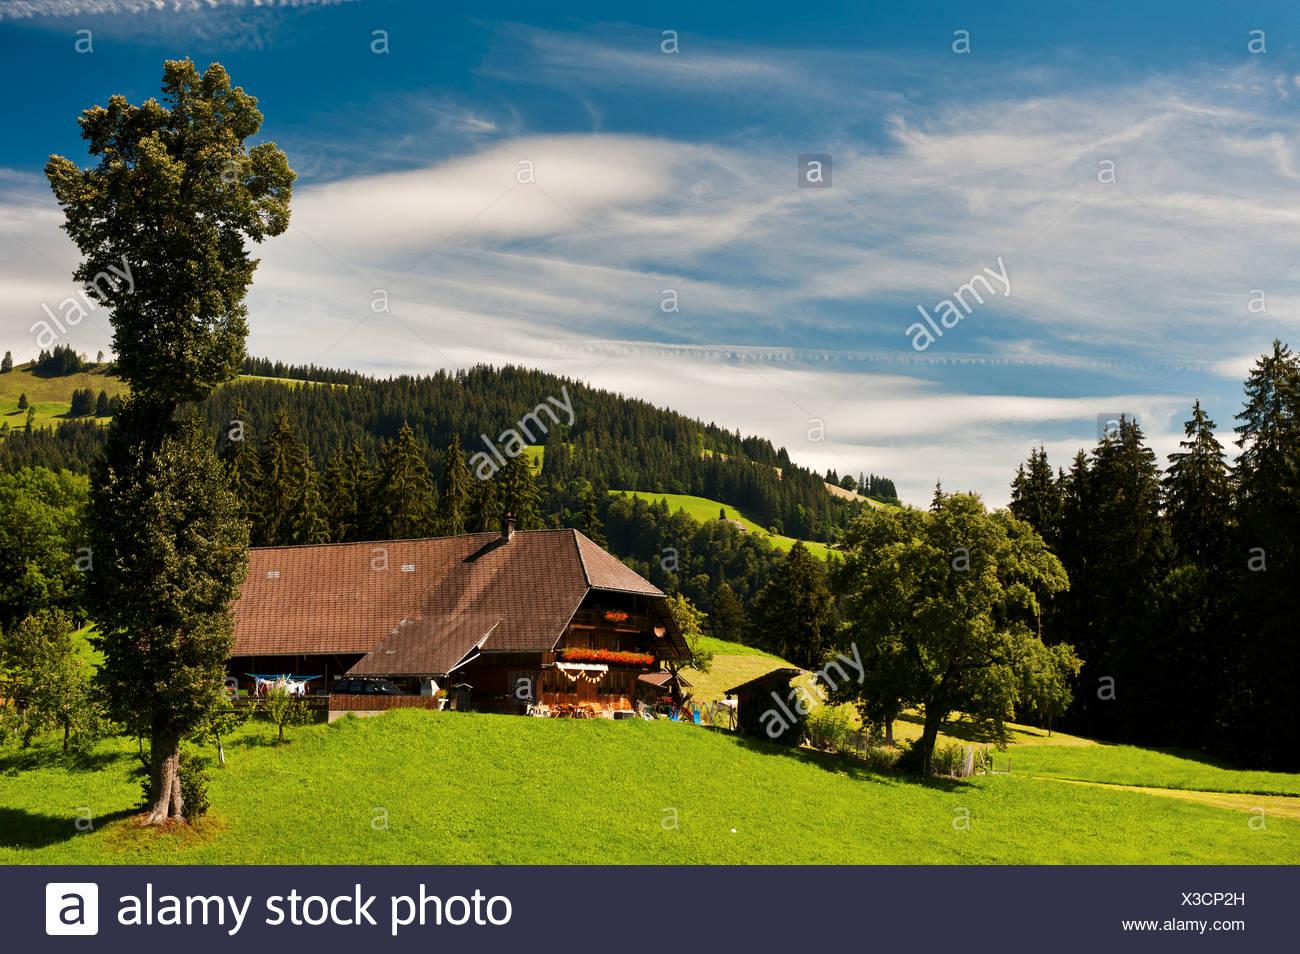 farm, farm house, farmstead, grassland, mountain farmer, Emmental, canton Bern, landscape, scenery, agriculture, farming, Switze - Stock Image